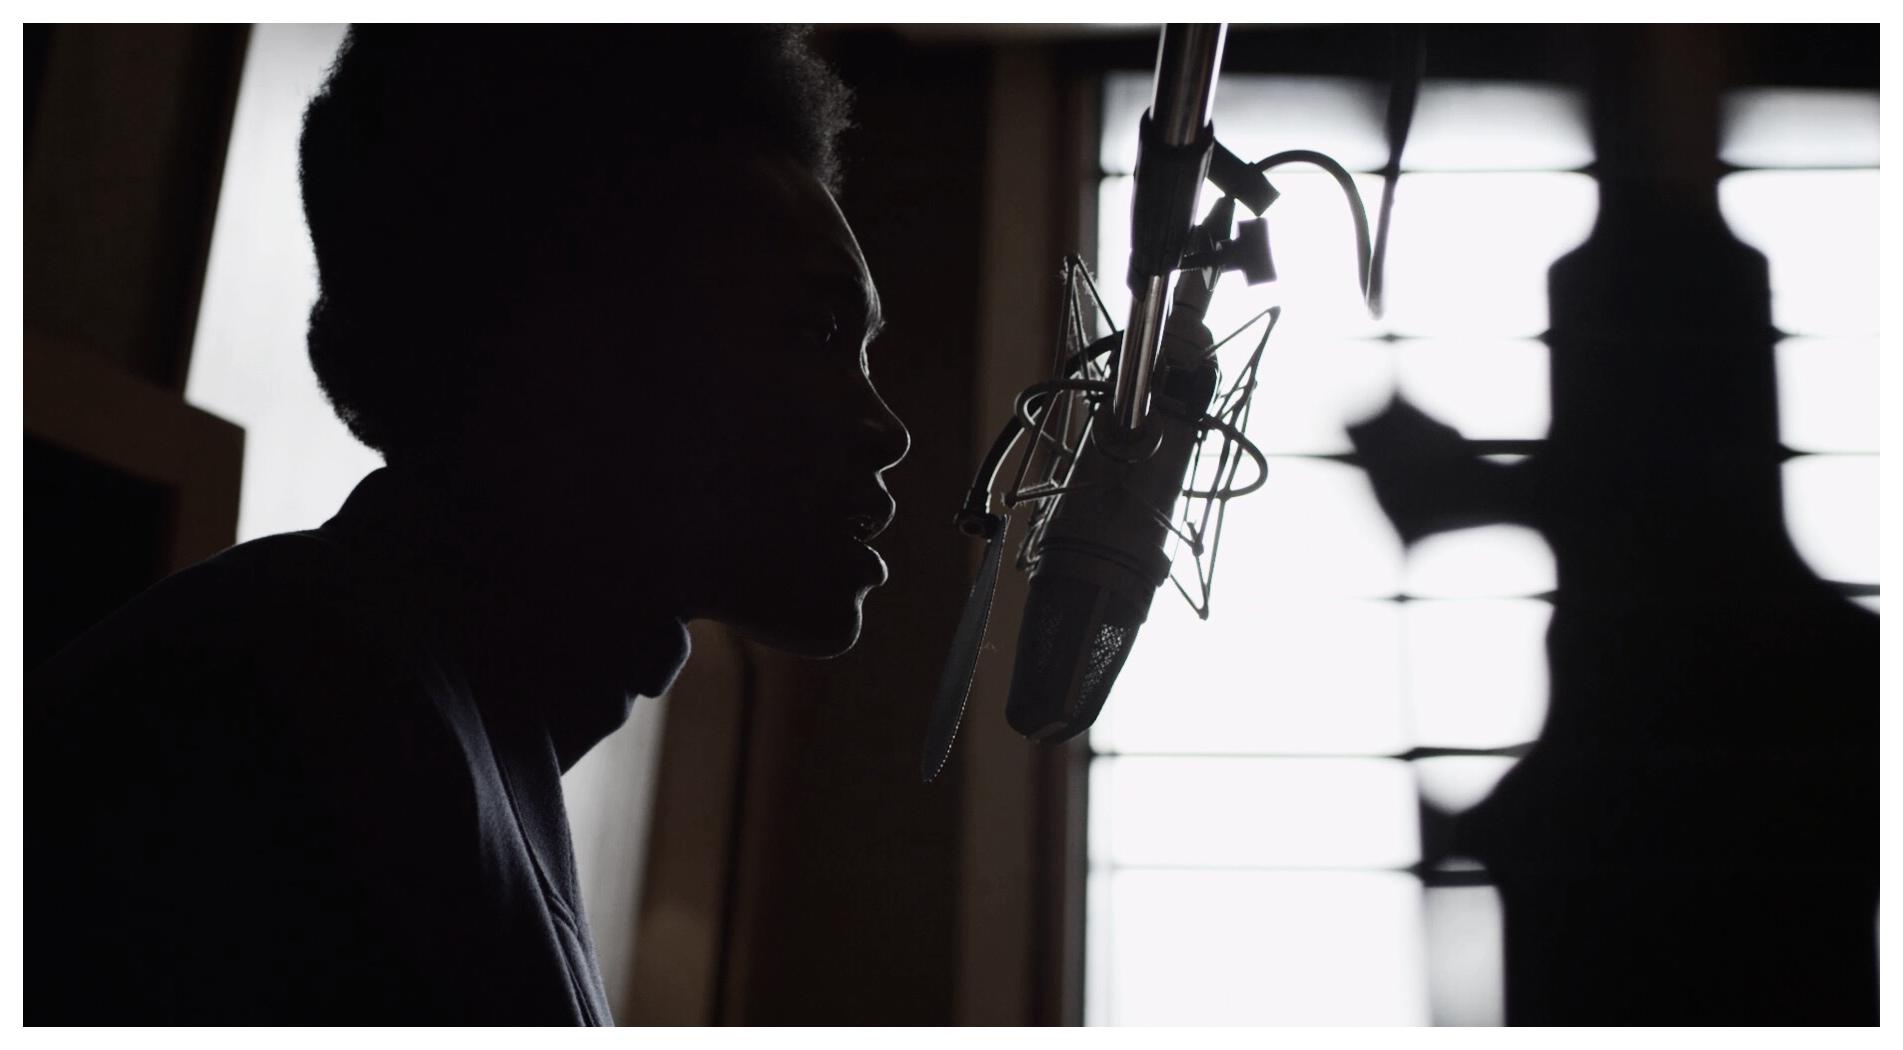 """Mr Burberry"" Benjamin Clementine Recording Session"